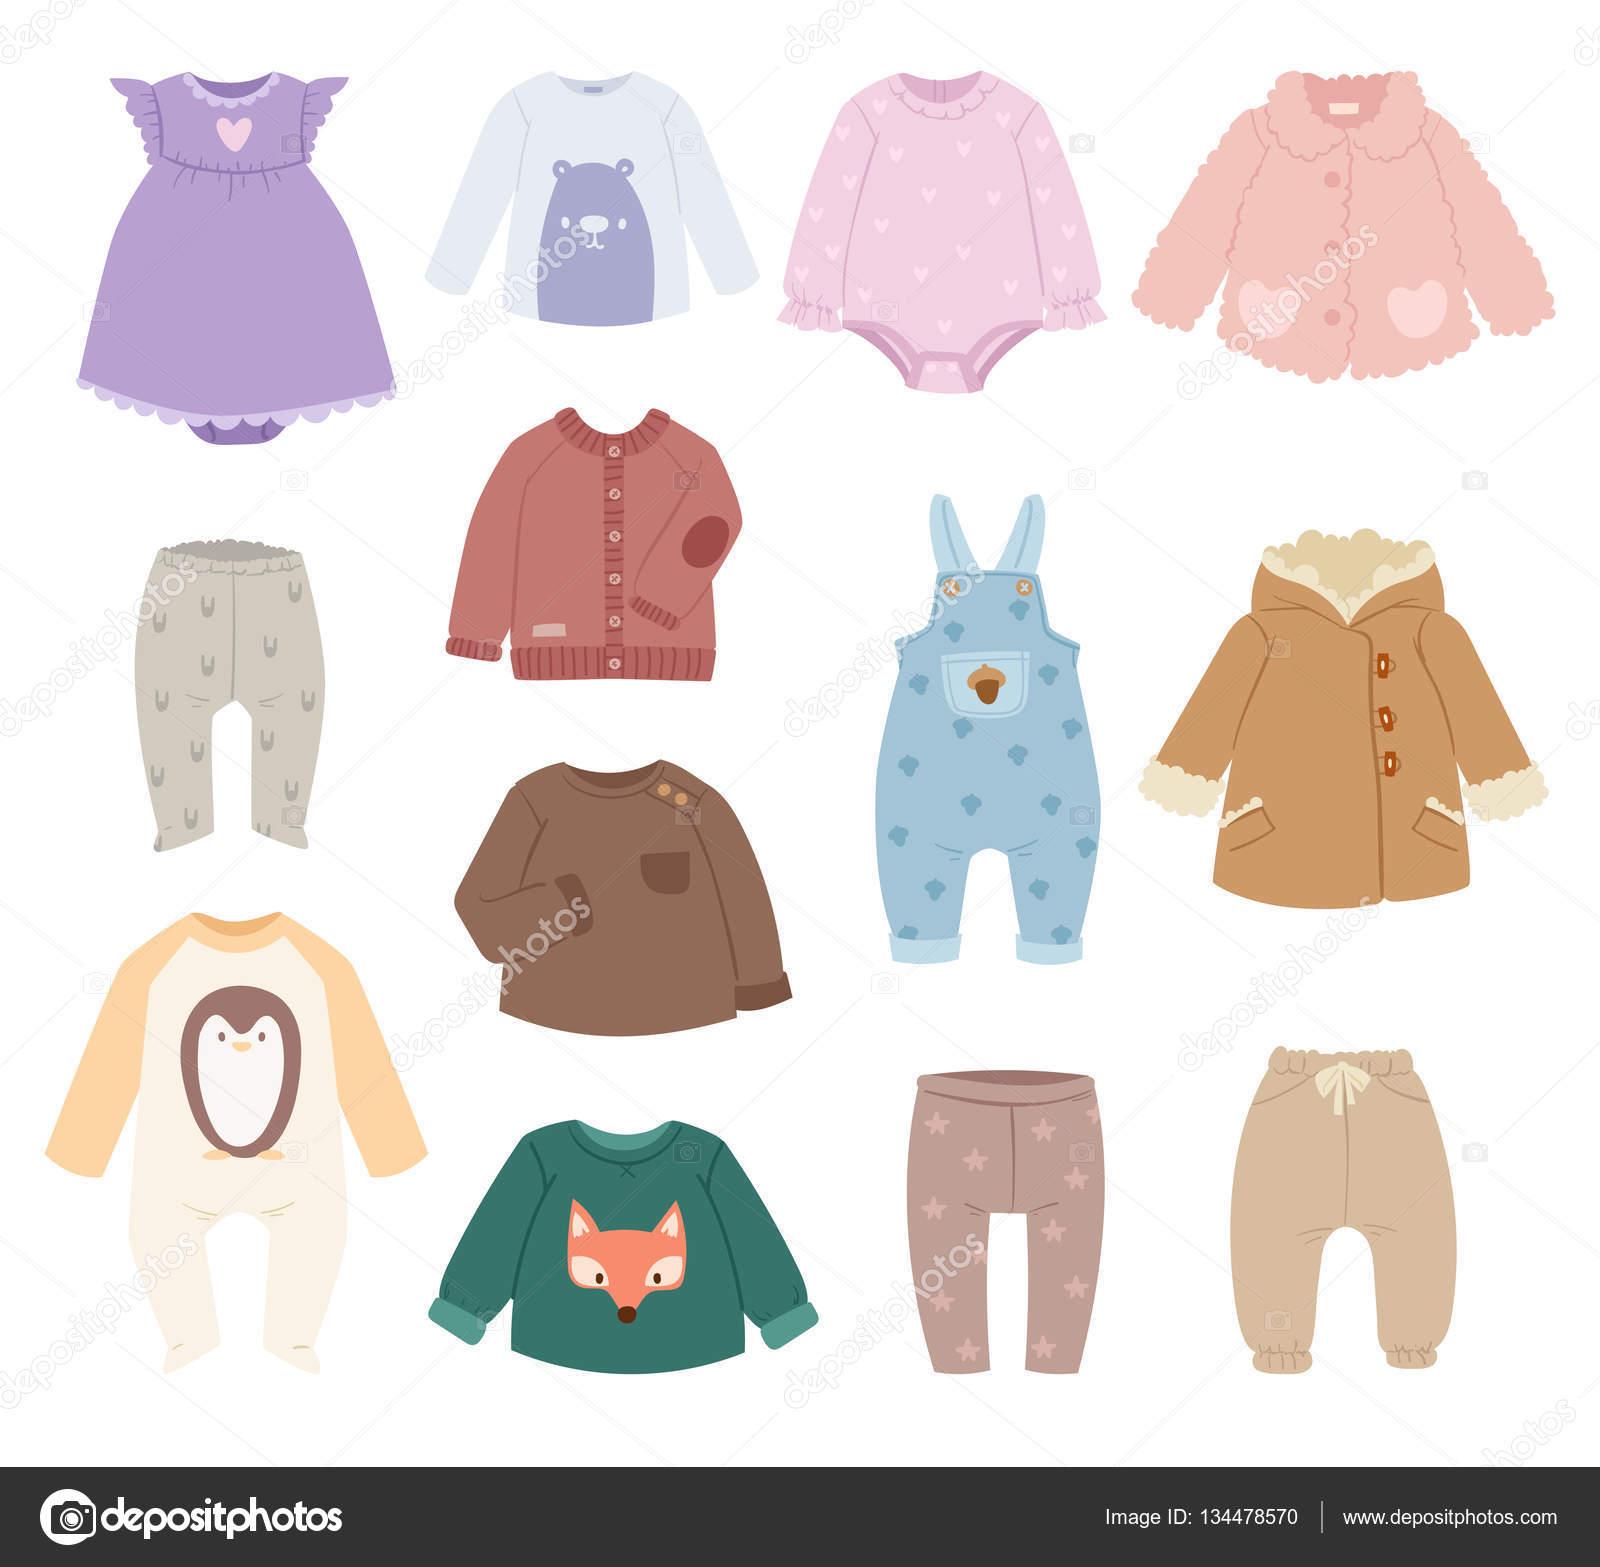 bebs beb vector de ropa infantil accesorios beb ropa moderna camisa coleccin fondo blanco los bebs usan ropa diseo ropa infantil moda algodn